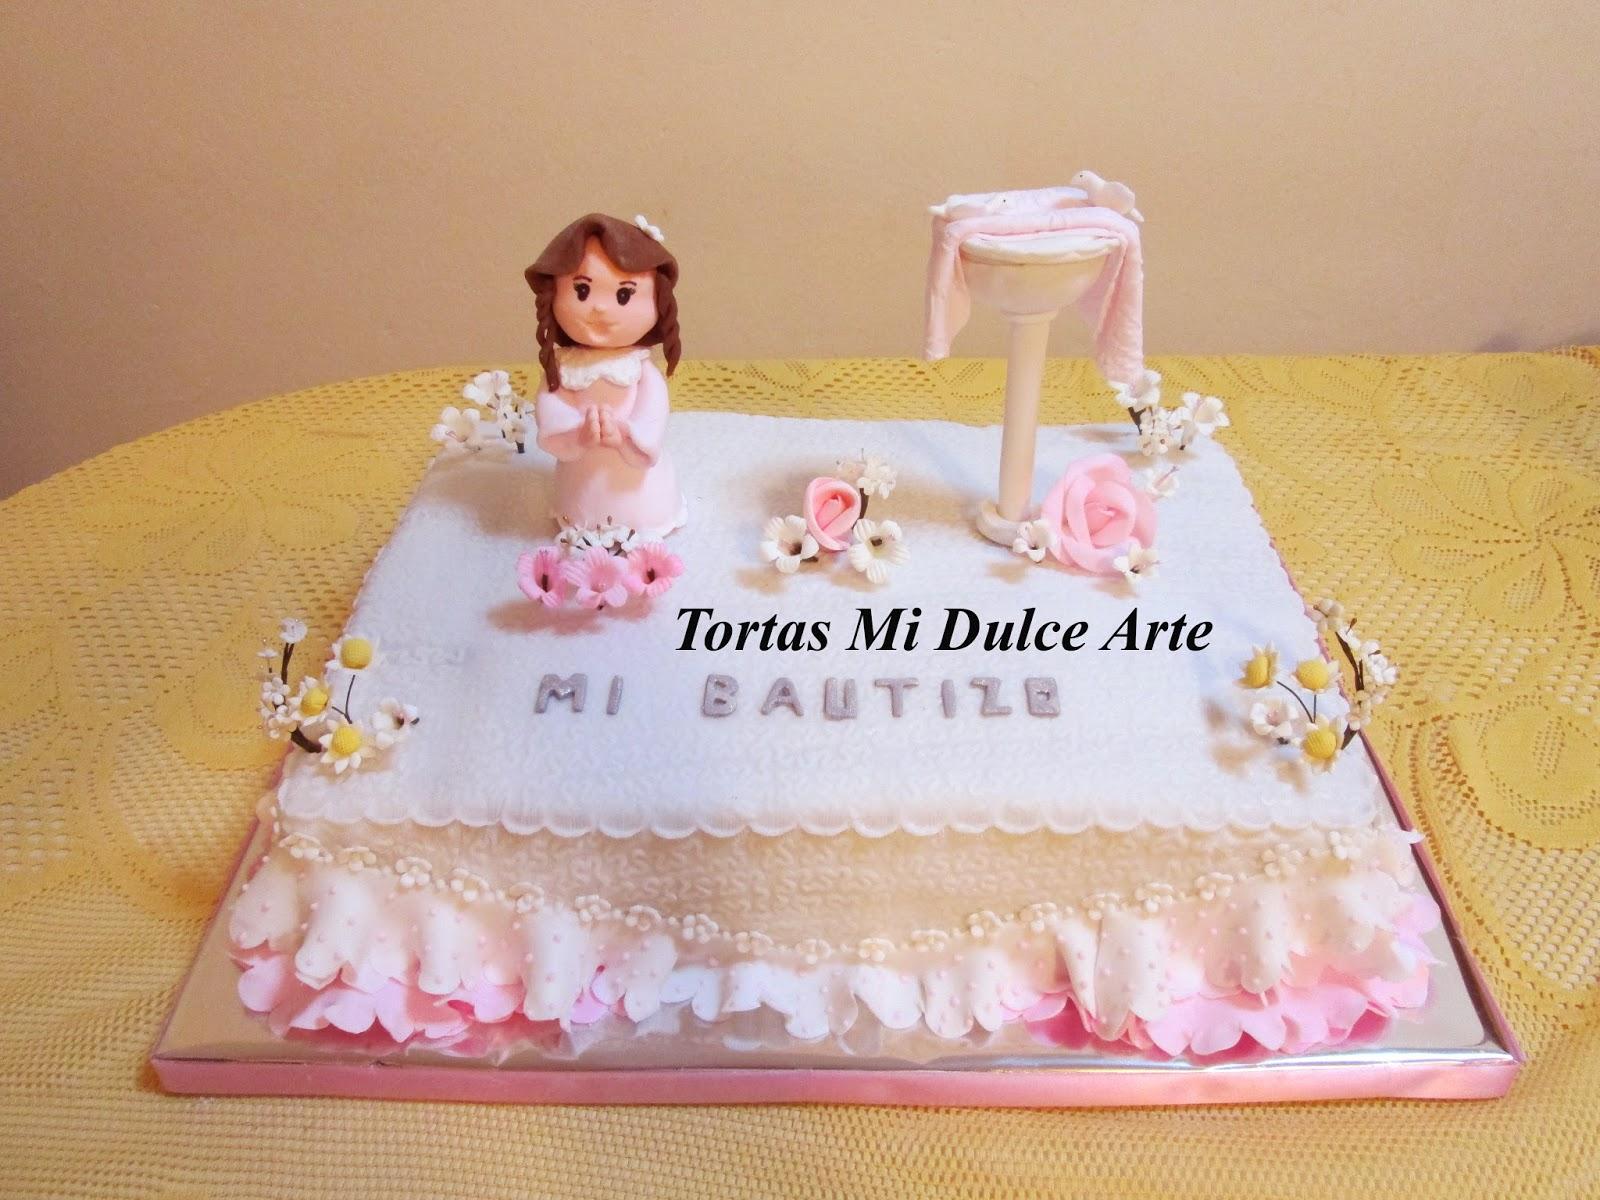 6 Tortas Cascada: TORTAS MI DULCE ARTE